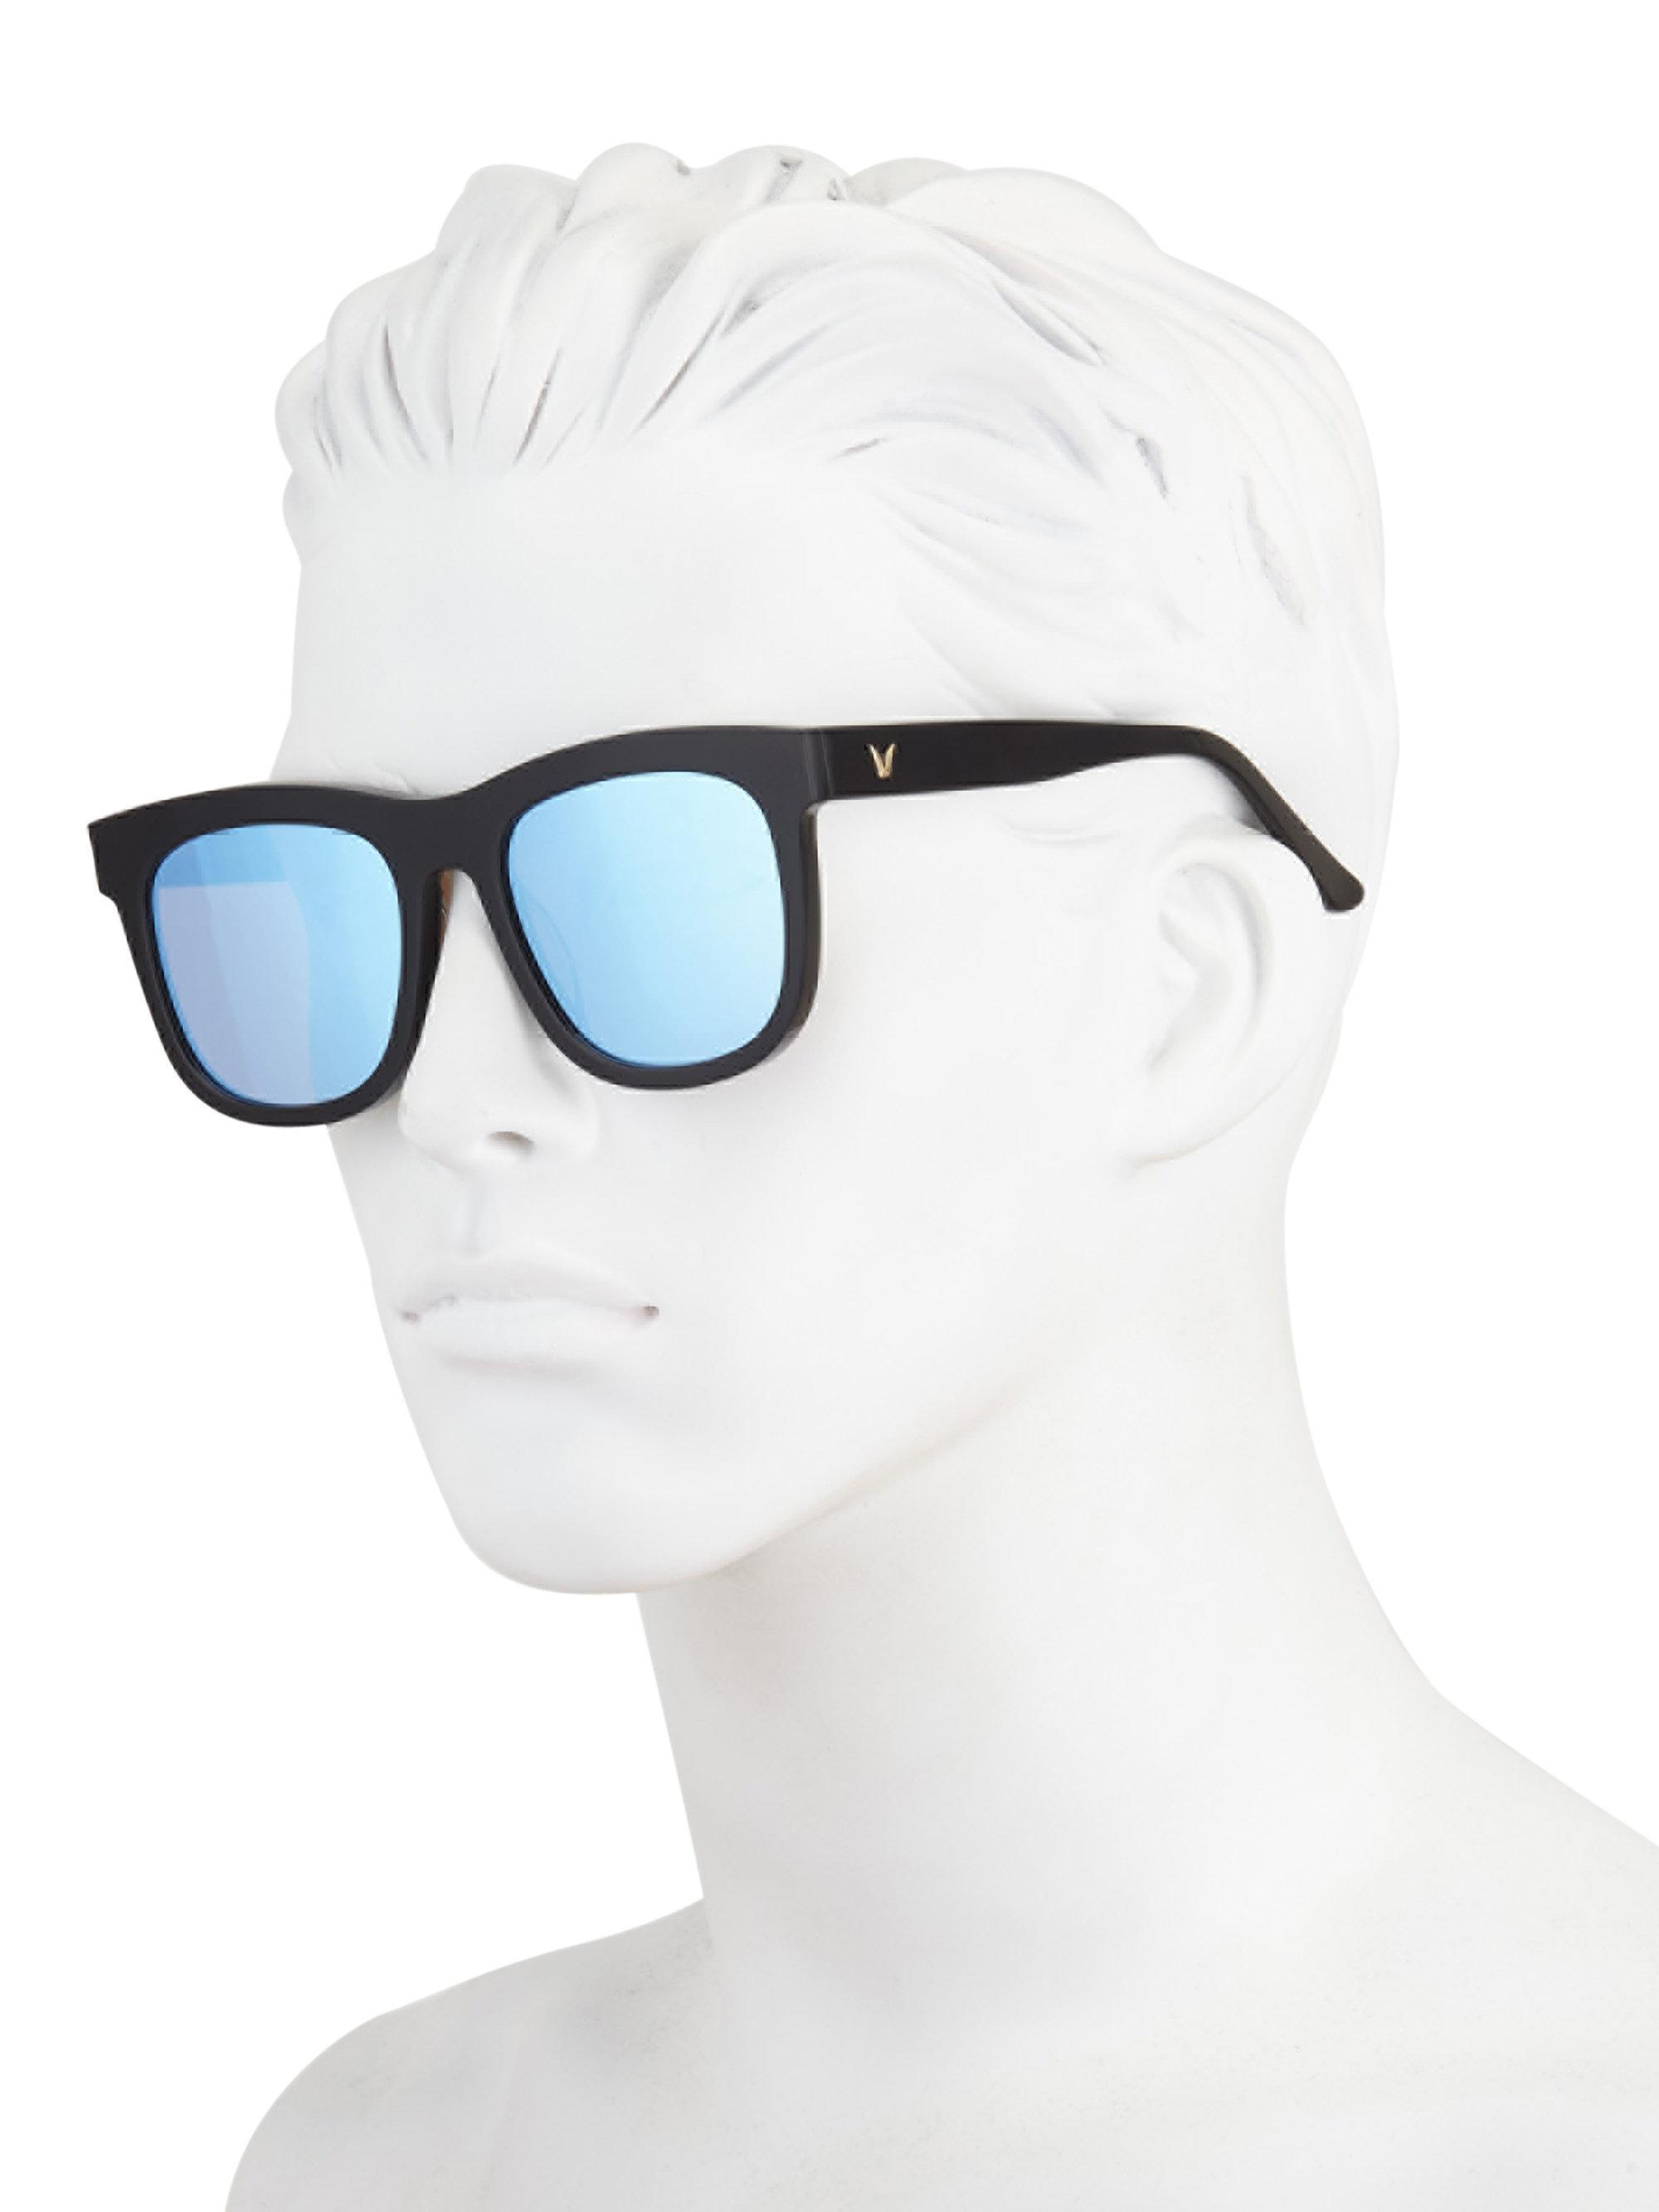 ae480f58c8d Lyst - Gentle Monster Pulp Fiction 53 Mm Wayfarer Sunglasses in ...